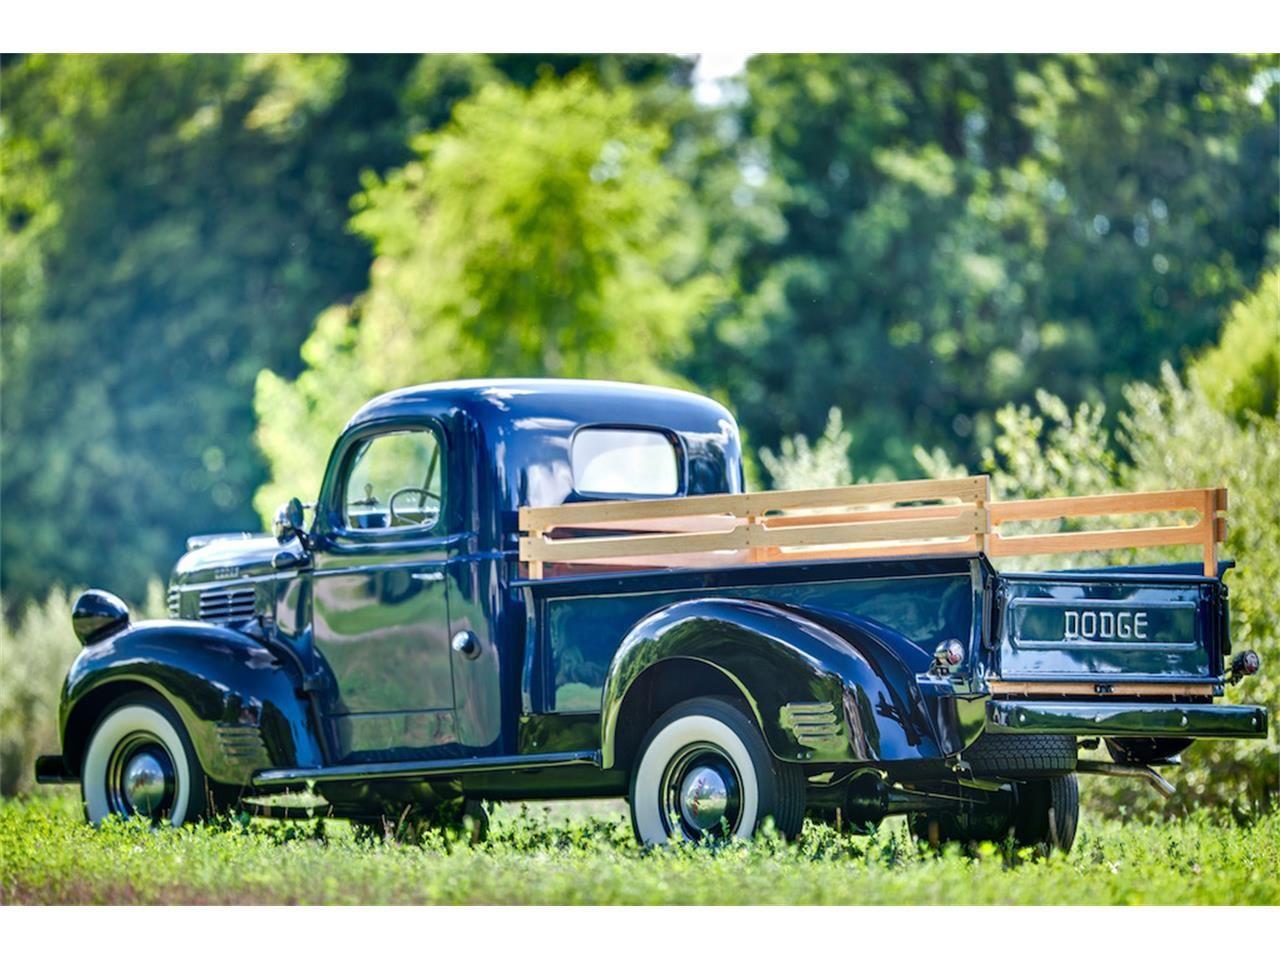 1947 Dodge Pickup | ClassicCars.com … | Pinteres…